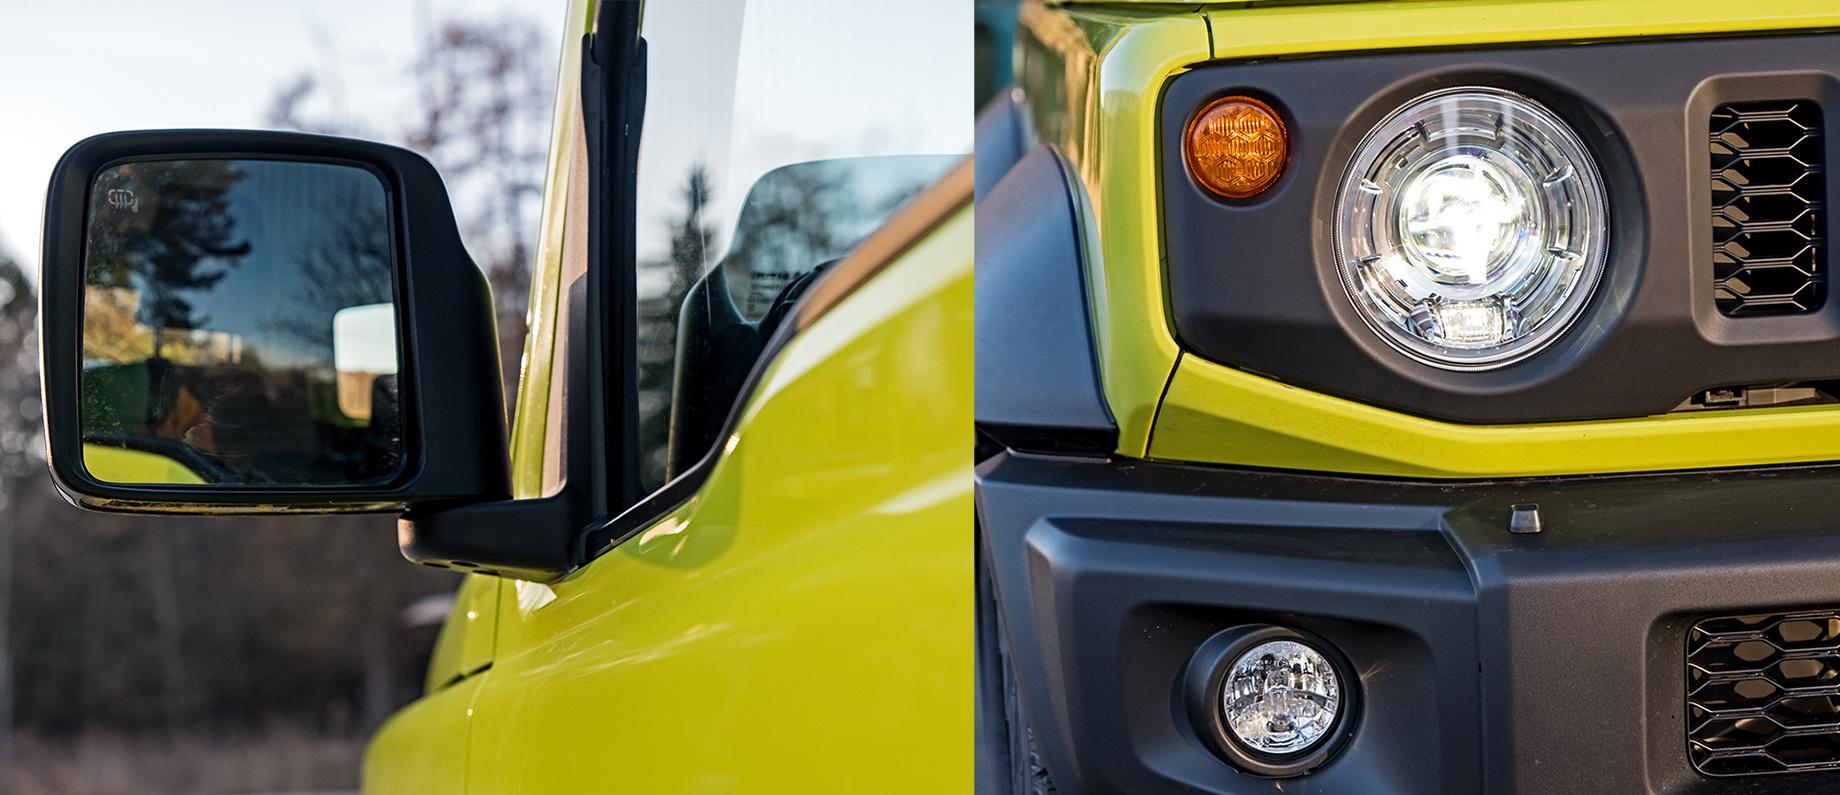 Реализуем превосходство Suzuki Jimny над предшественником